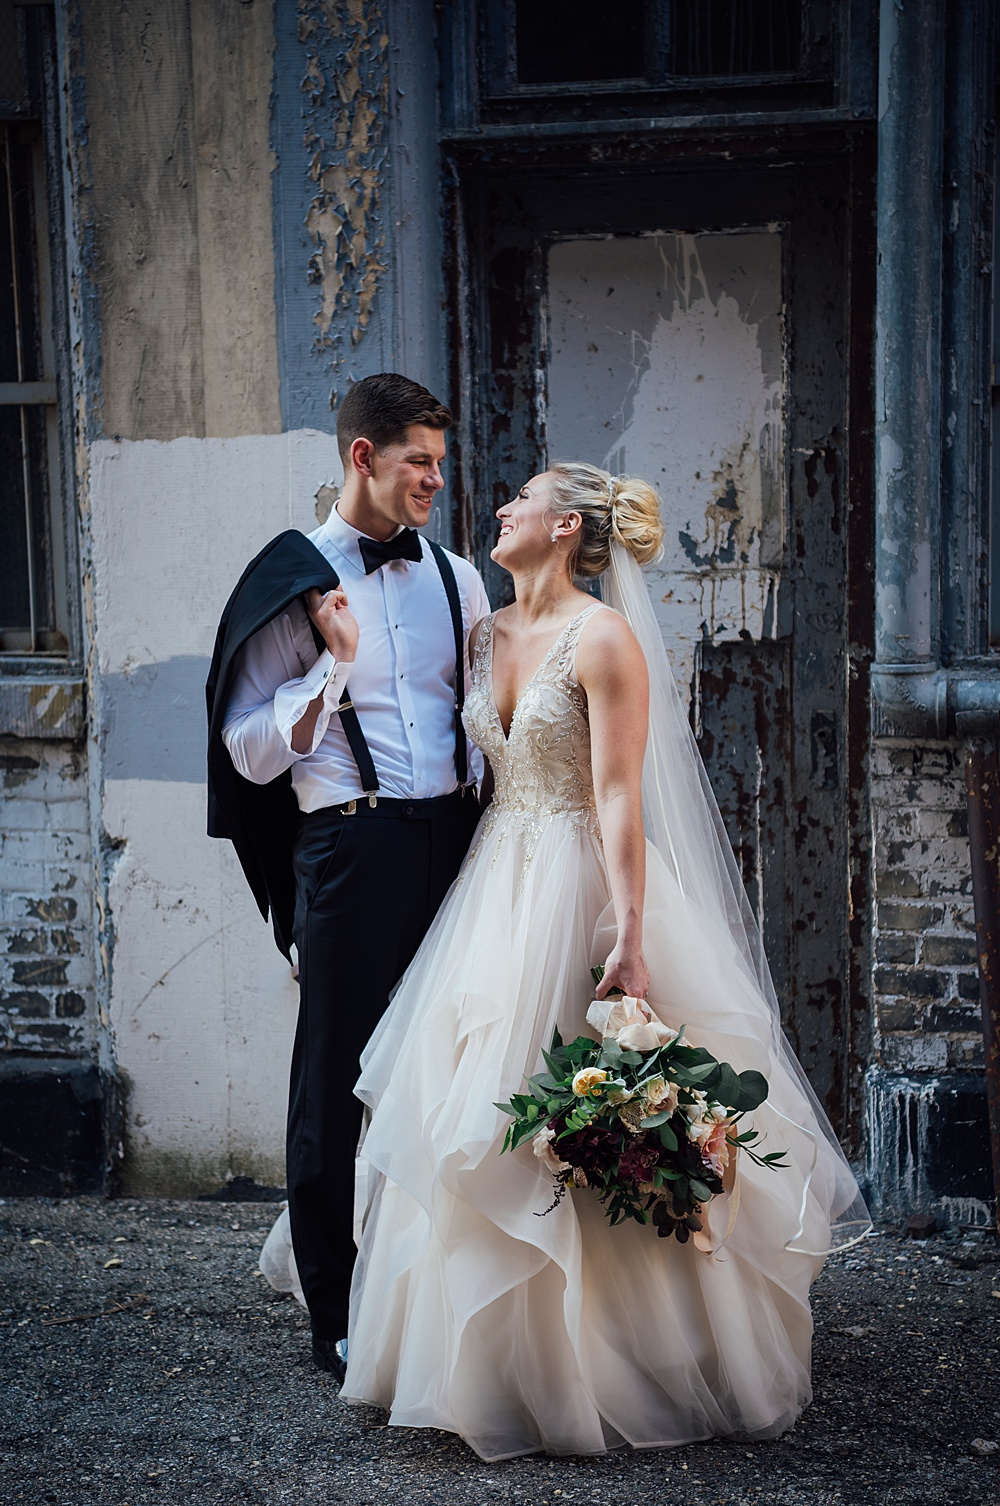 Fountain_Street_Church_wedding152.jpg